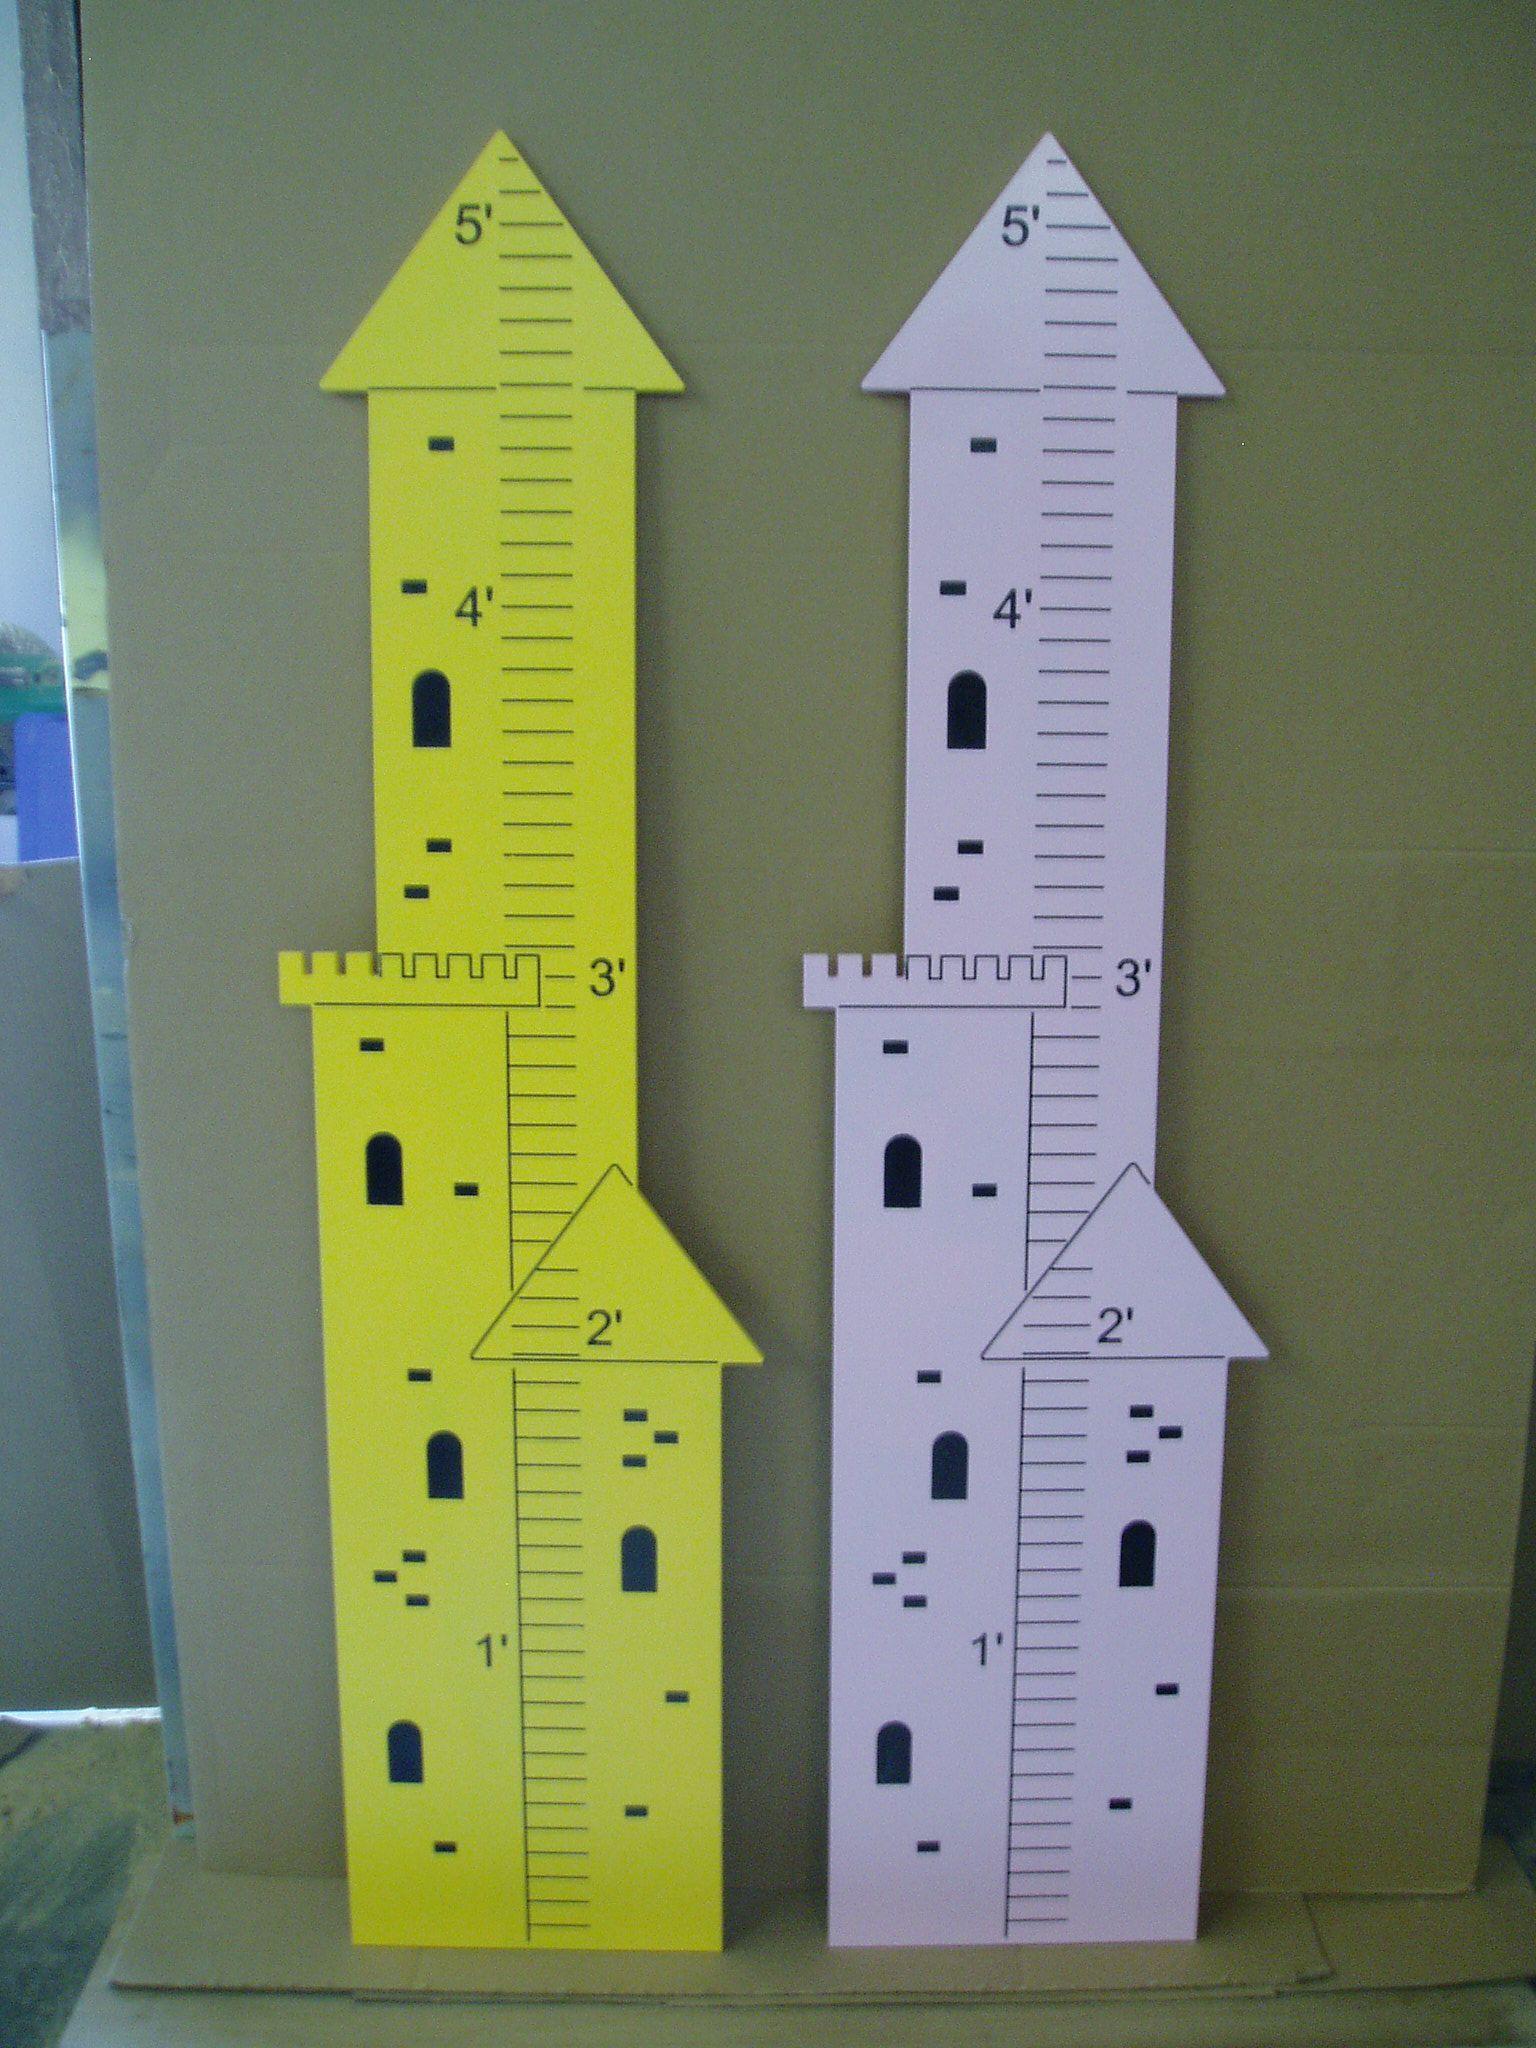 A princess dream wooden castle growth chart as seen 15000 wooden castle growth chart as seen 15000 unfinished nvjuhfo Gallery